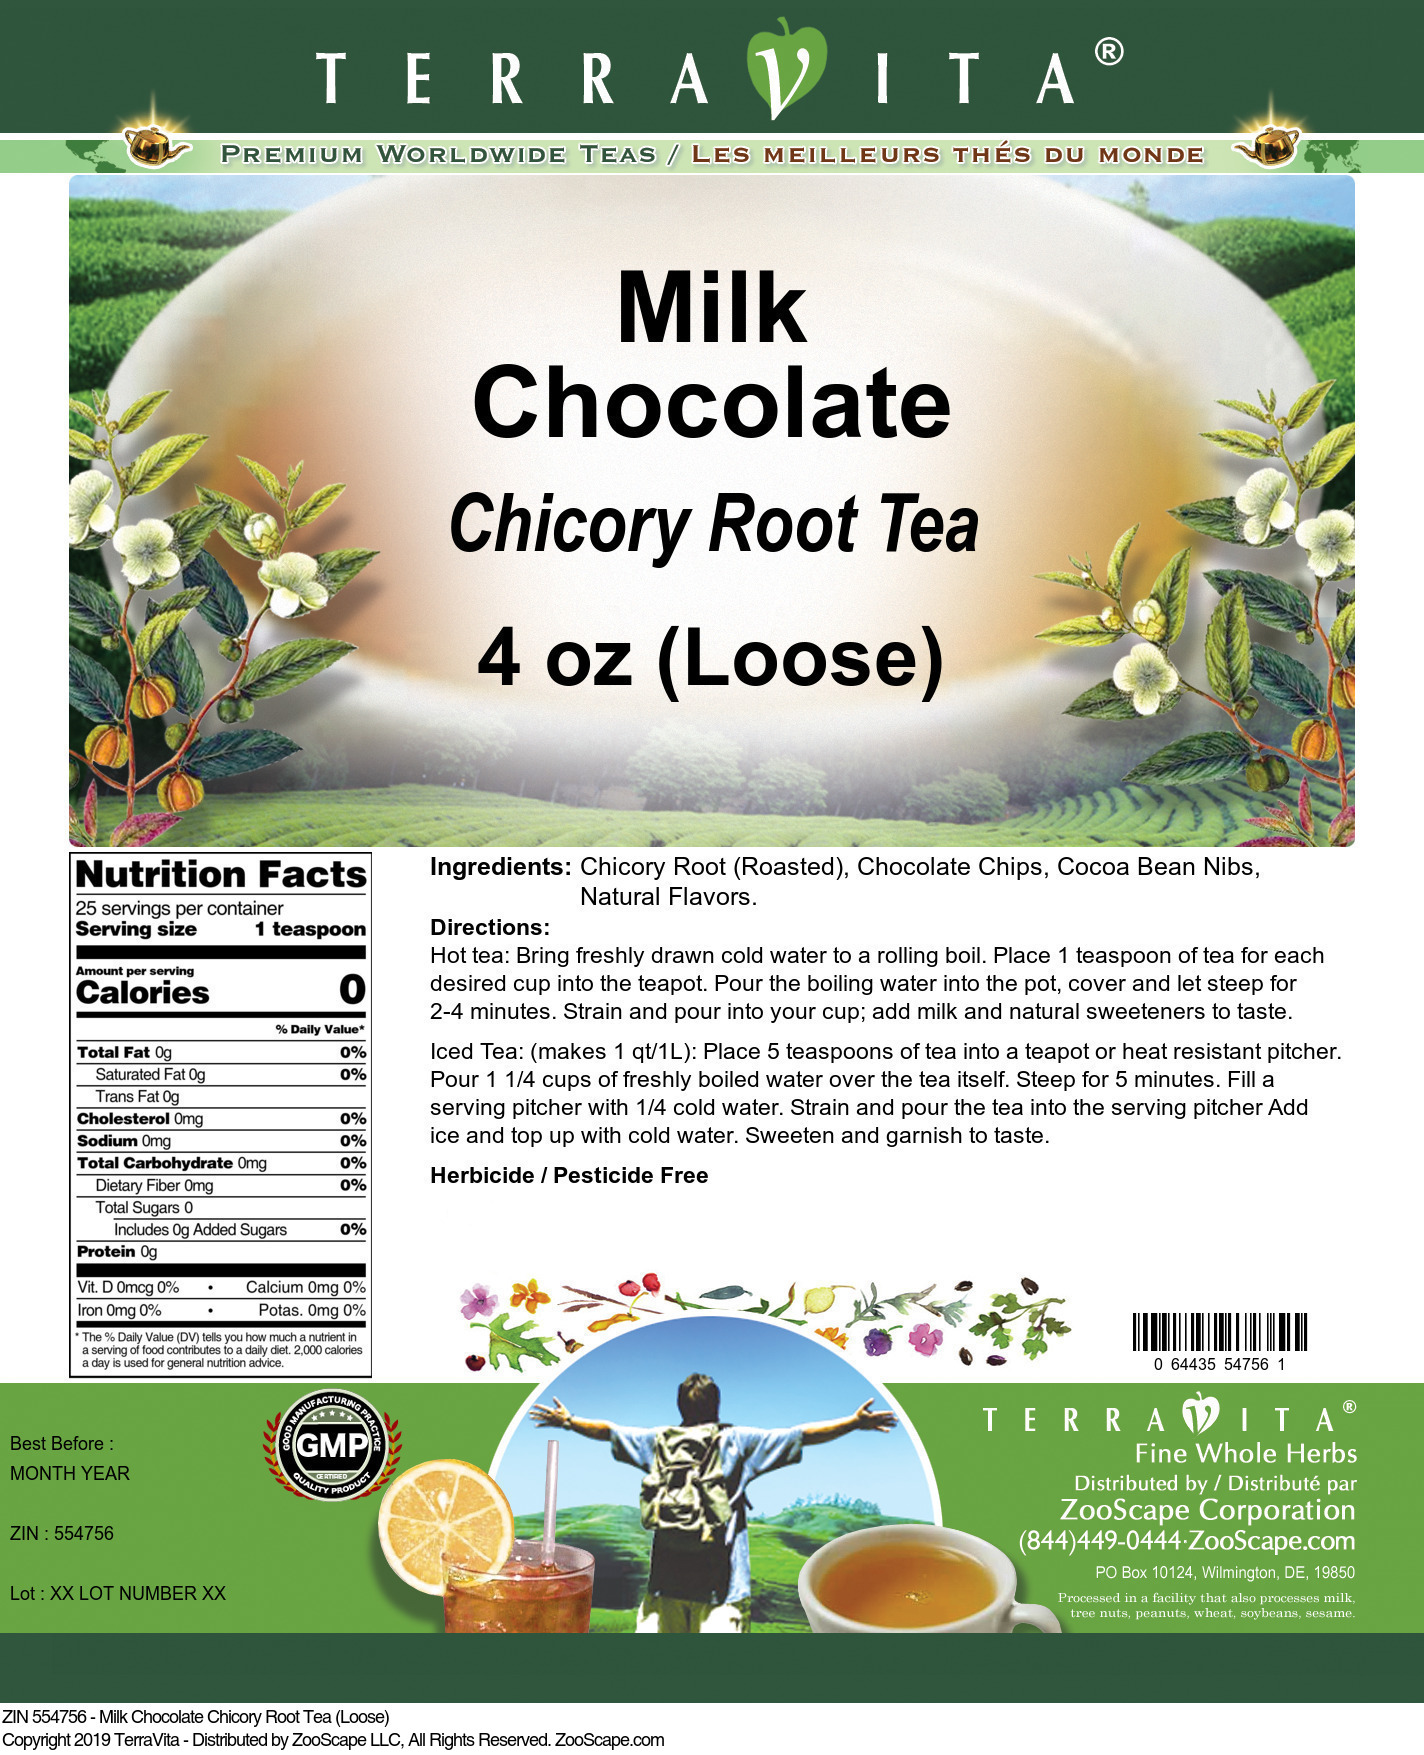 Milk Chocolate Chicory Root Tea (Loose)